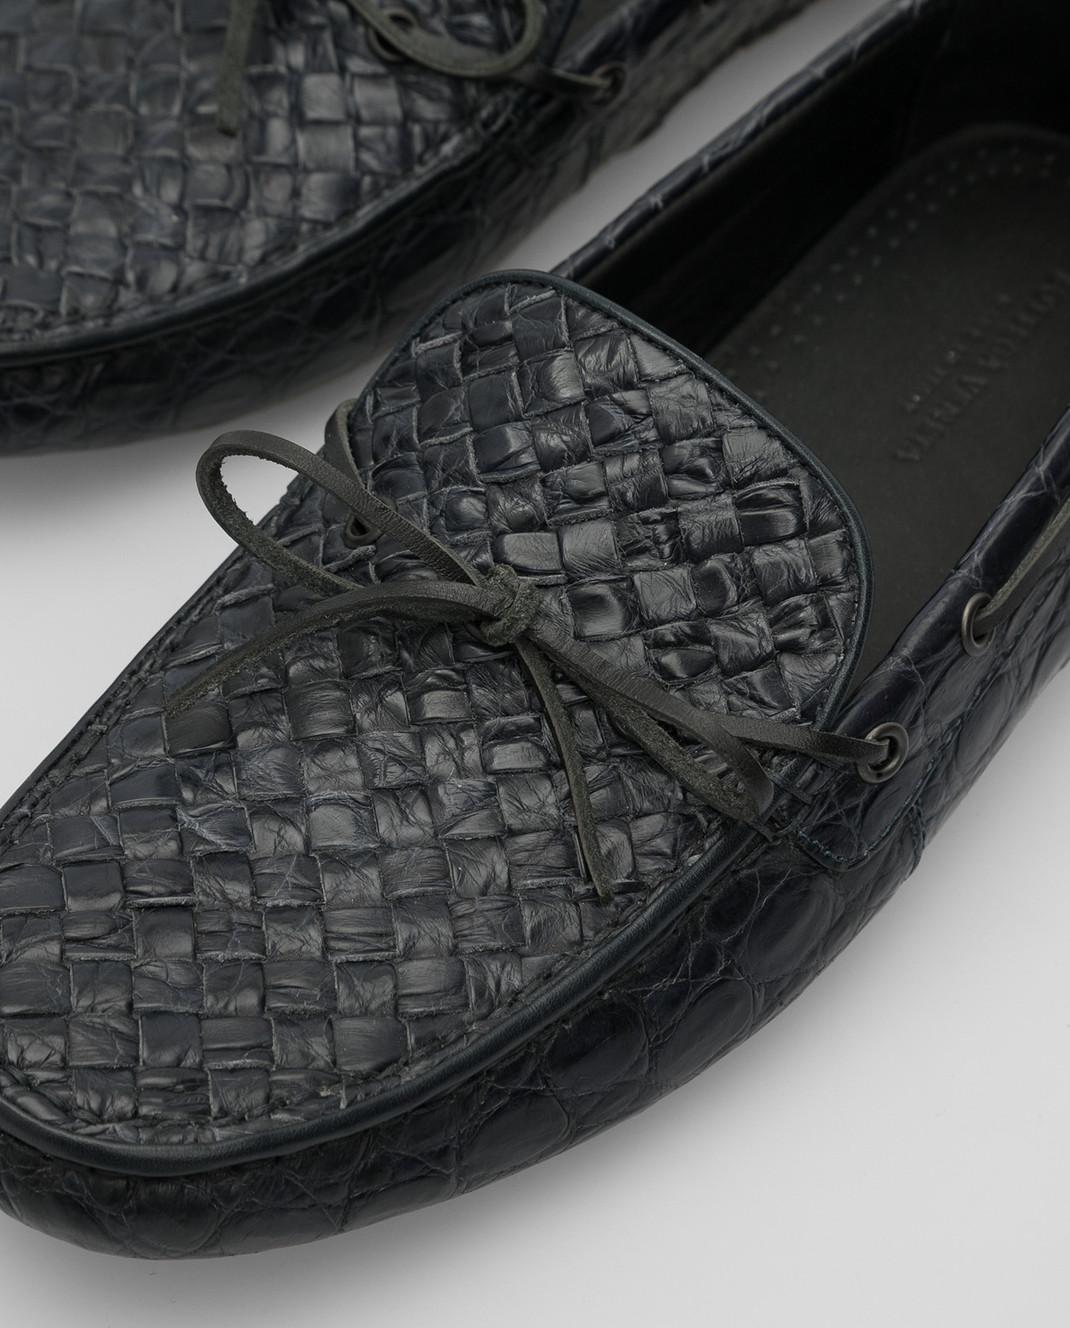 Bottega Veneta Темно-синие мокасины из кожи крокодила 325894 изображение 5